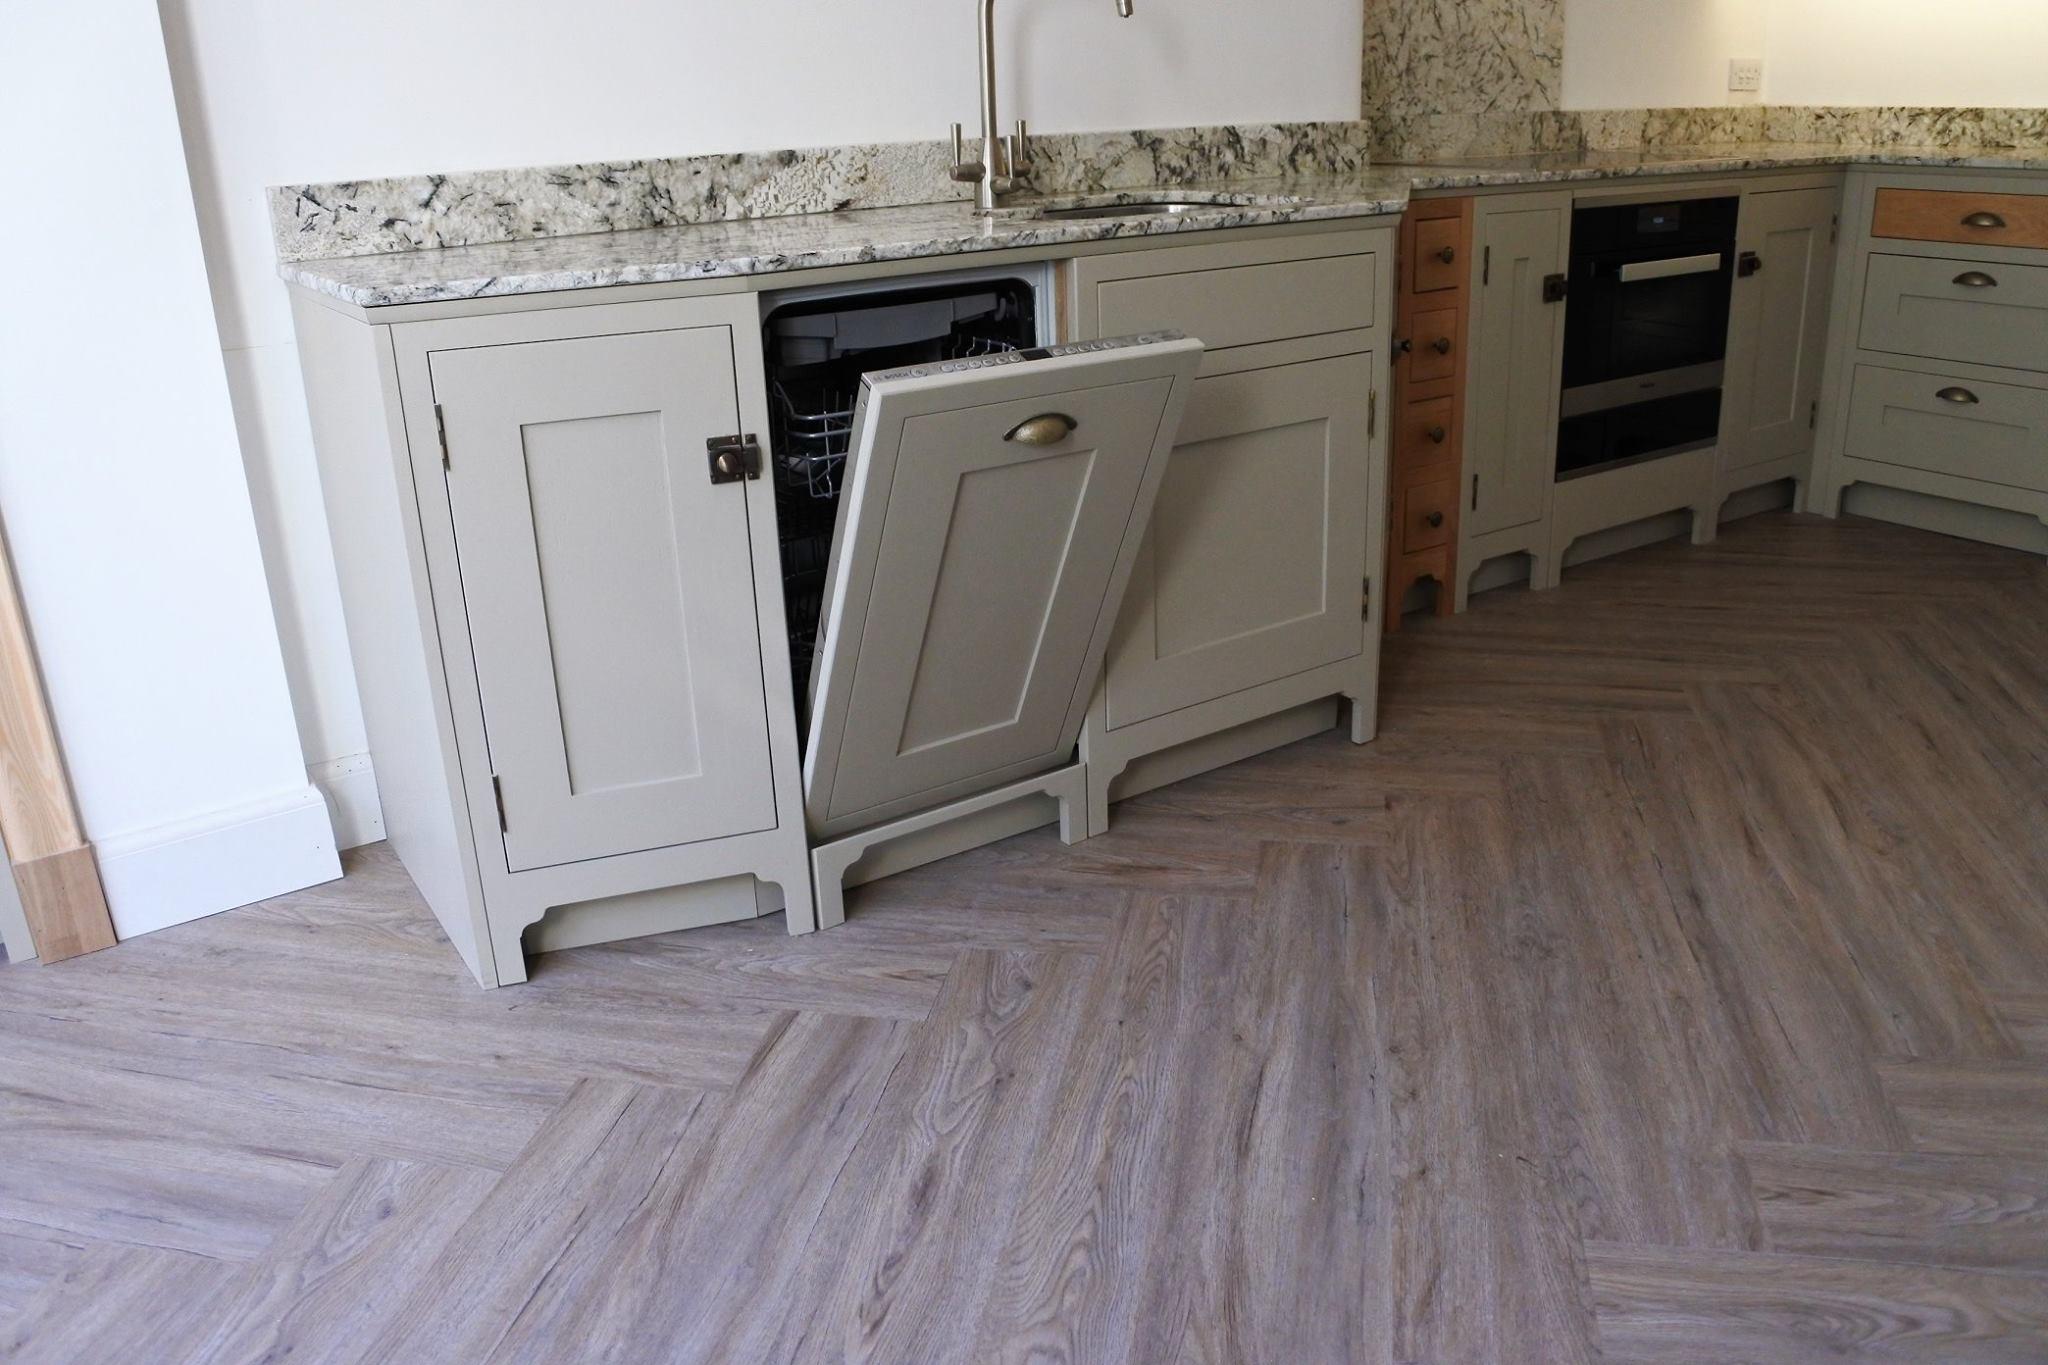 glasgow-bespoke-kitchens-dishwasher